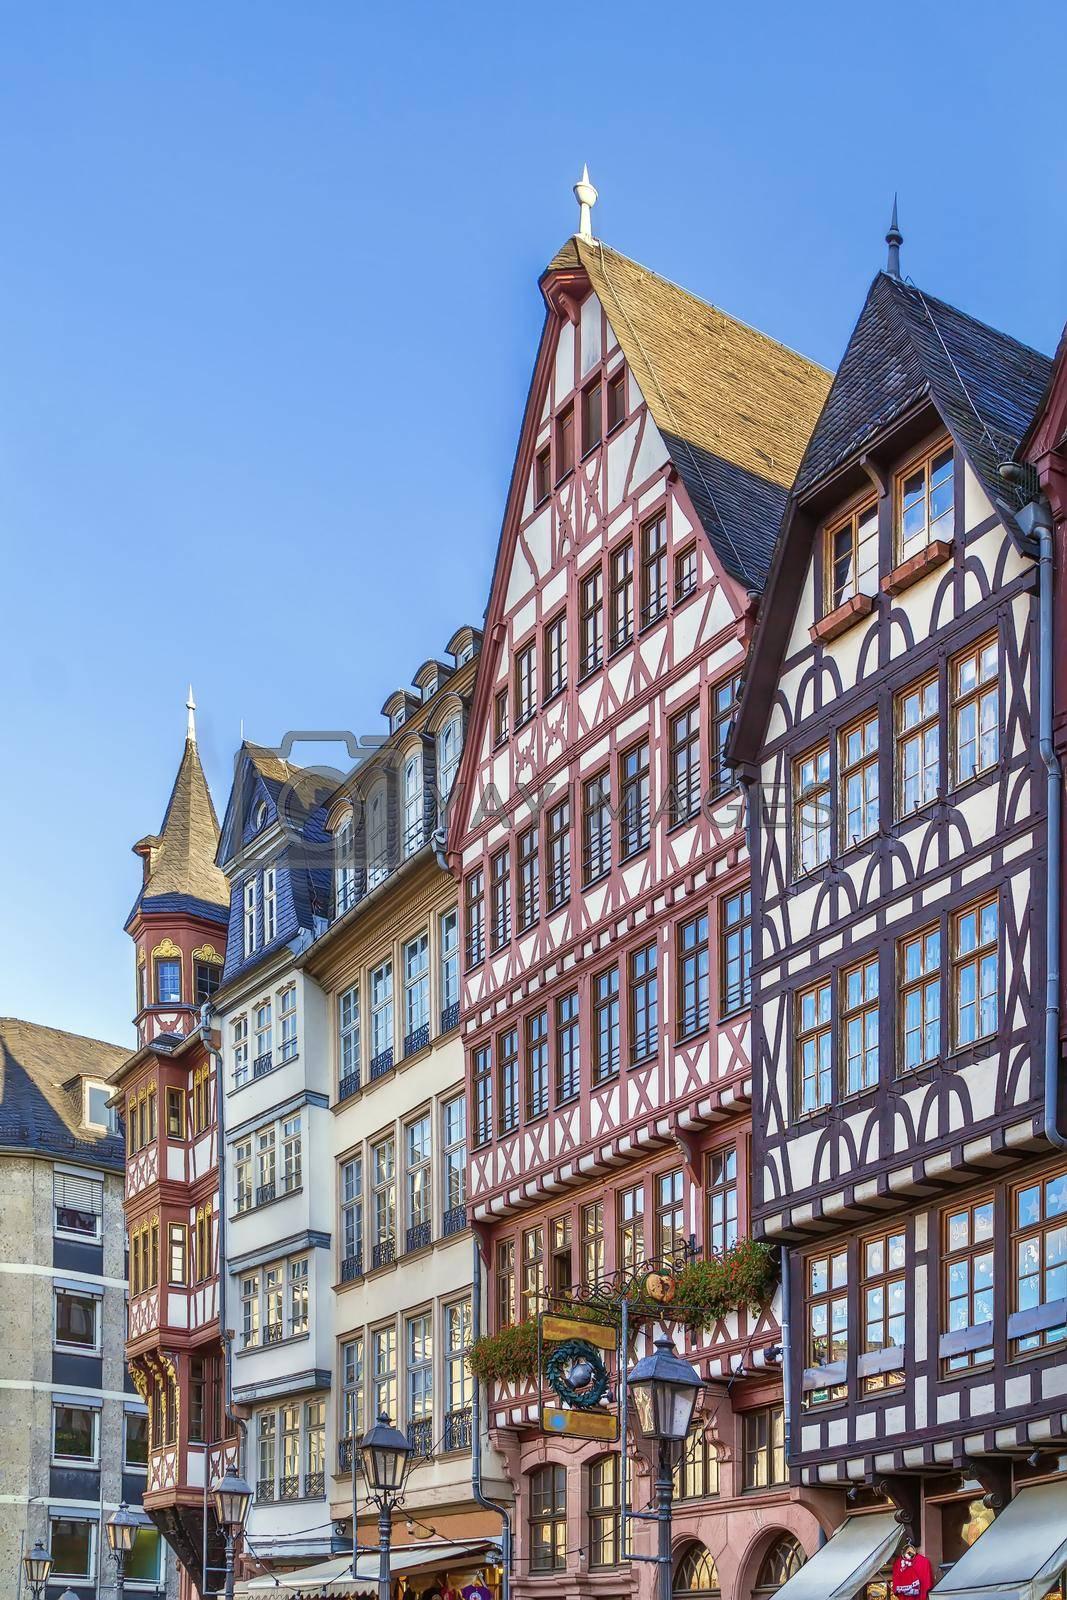 Royalty free image of Romerberg square, Frankfurt, Germany by borisb17